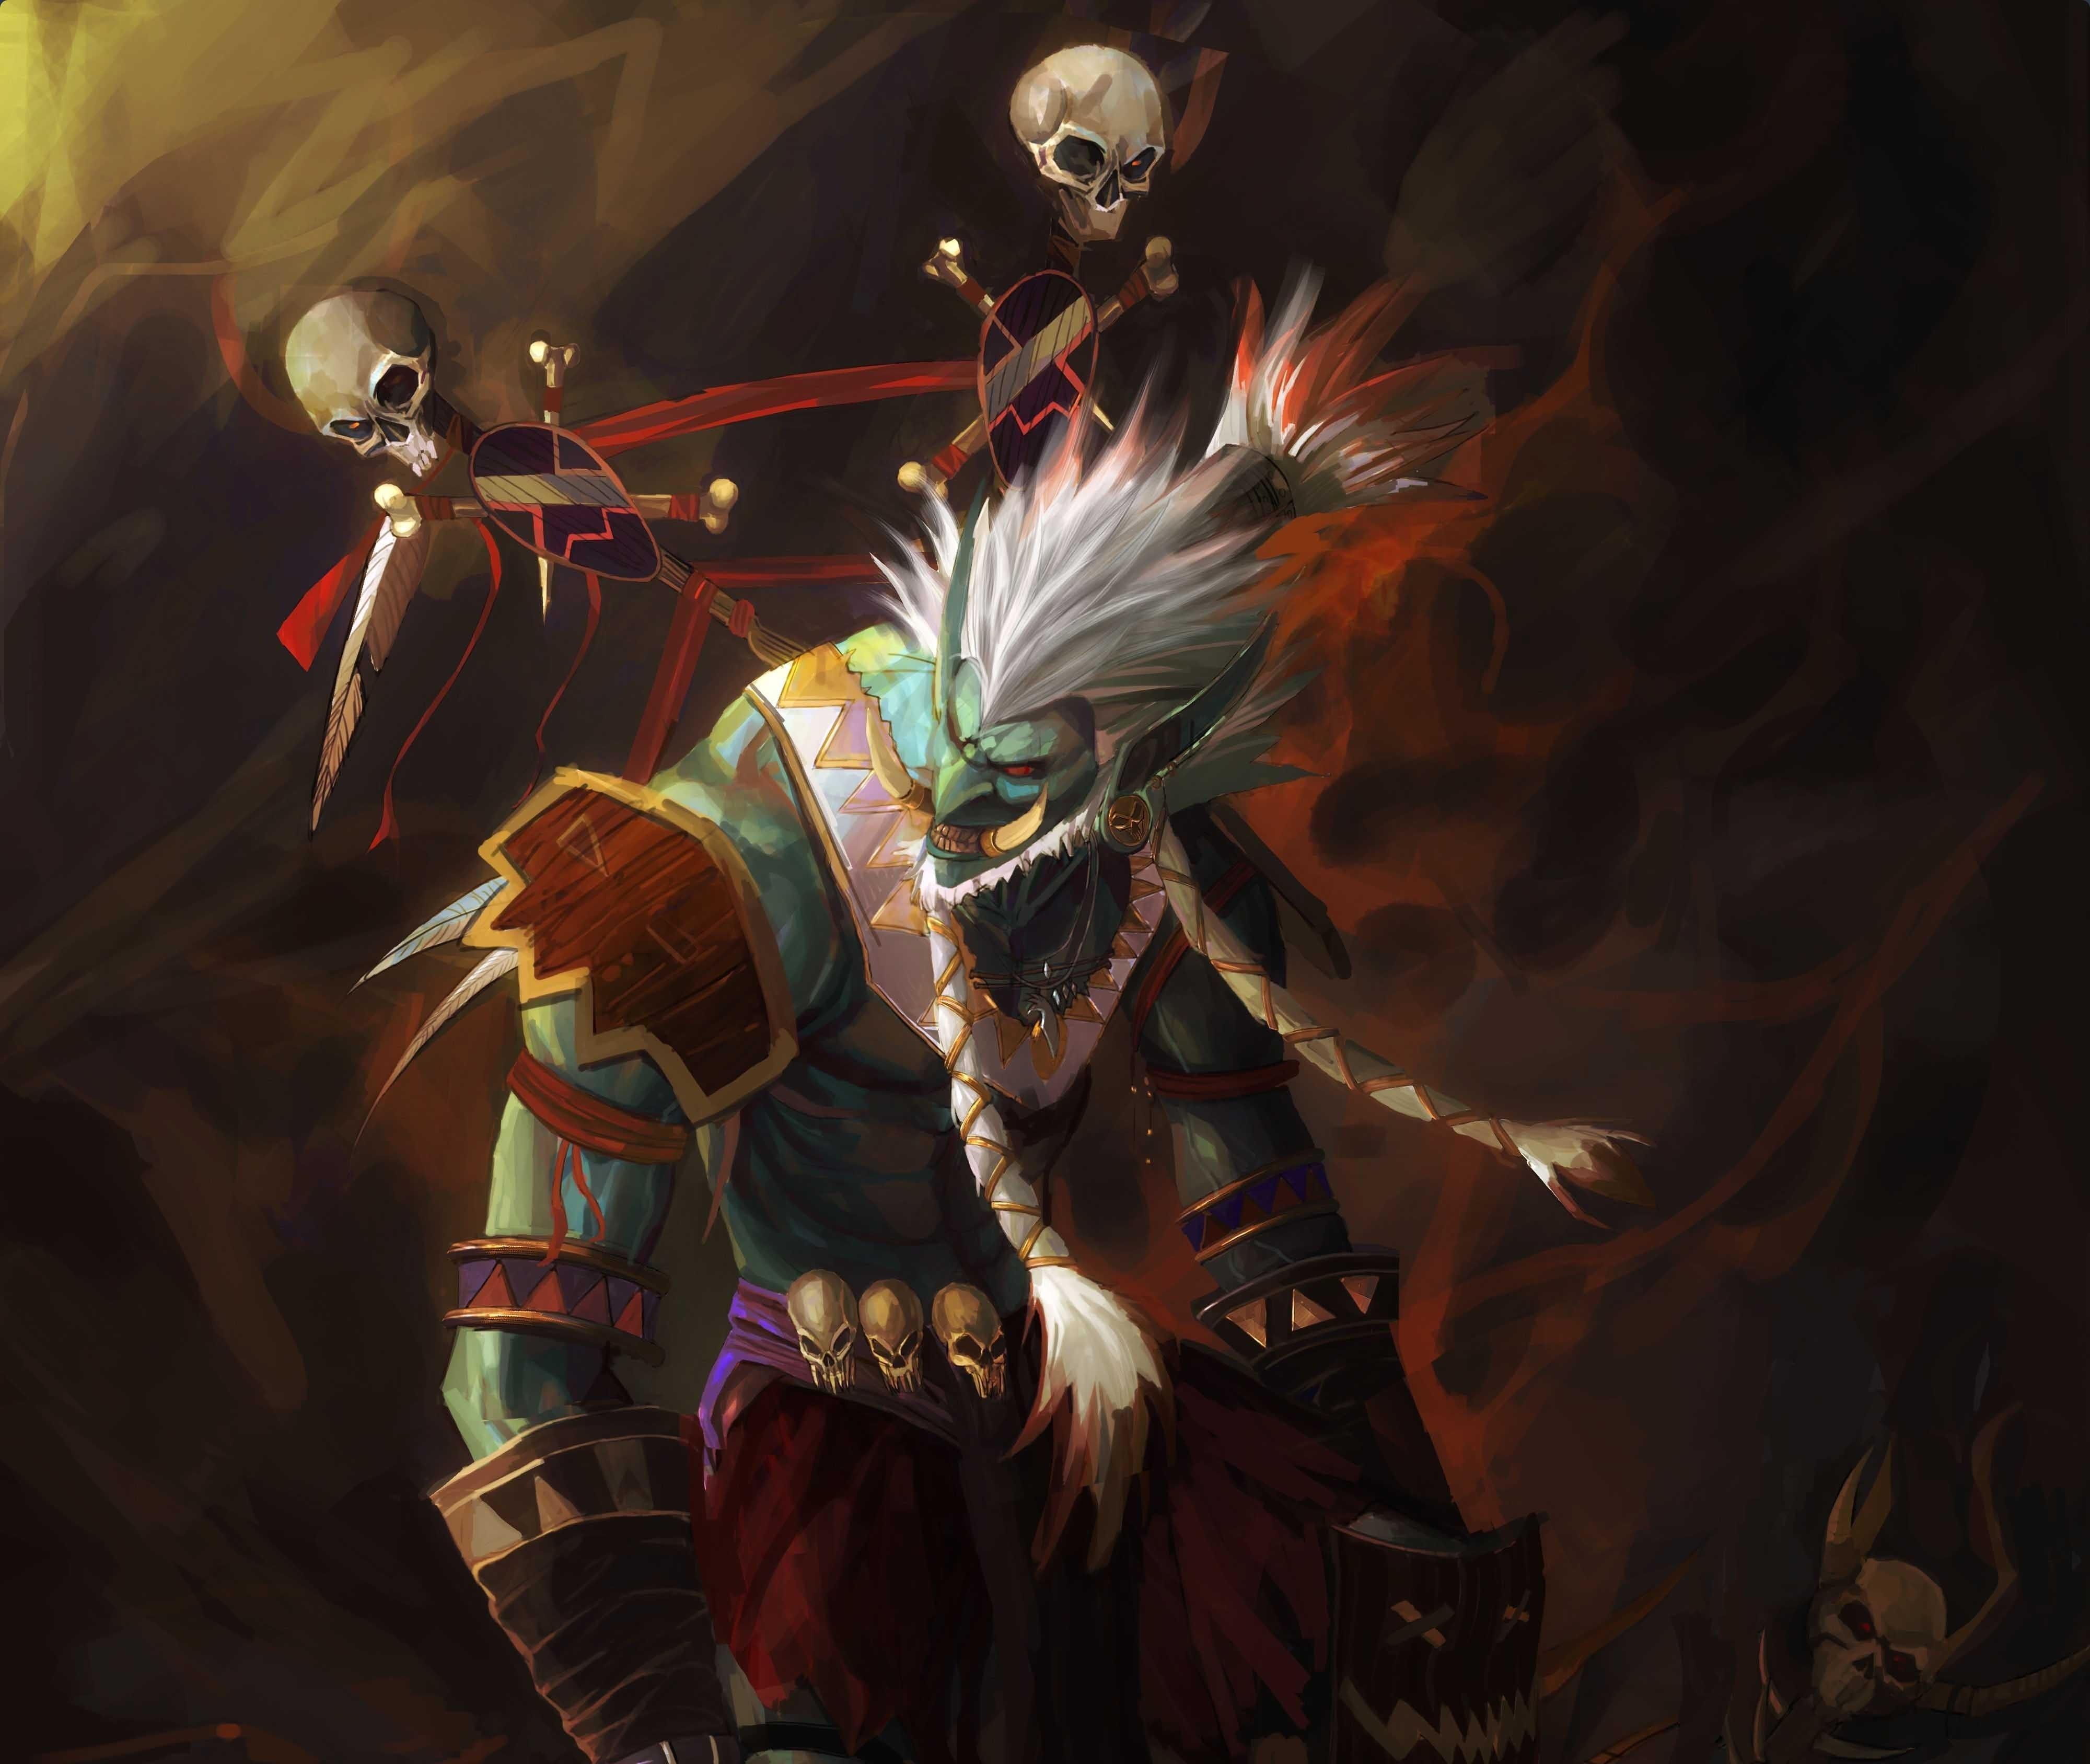 World Of Warcraft, Troll, Shaman, HD 4K Wallpaper